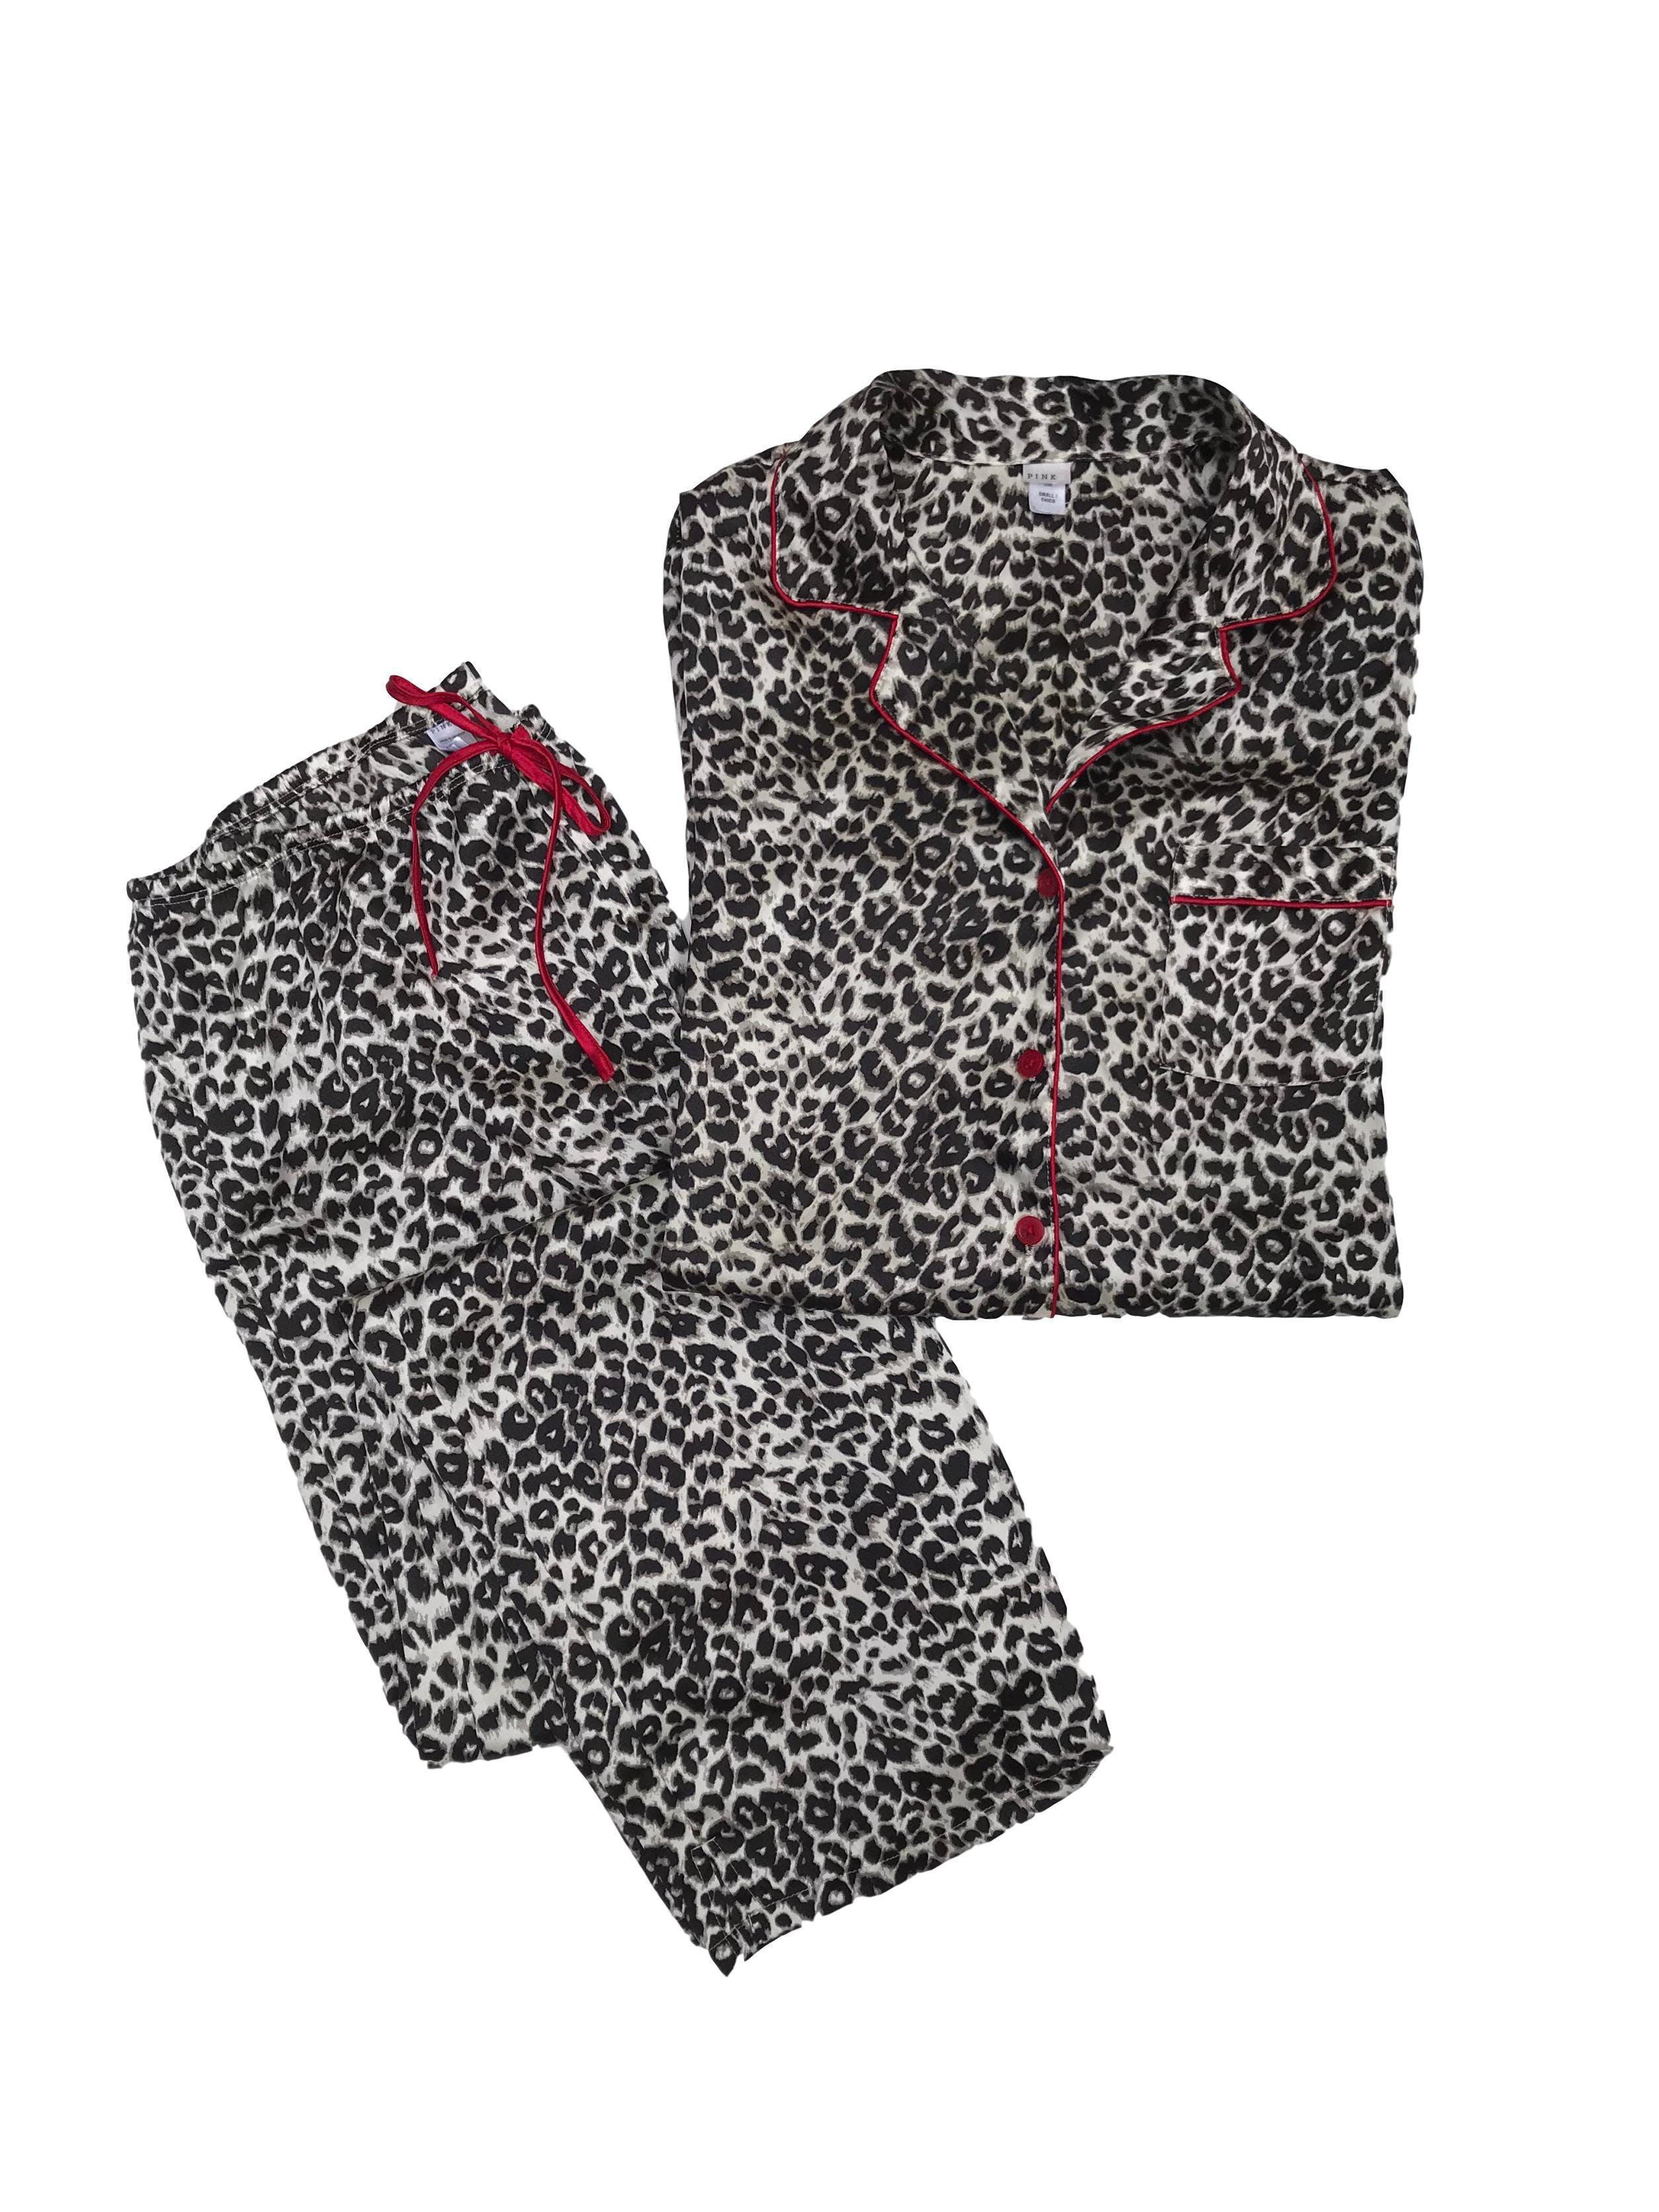 Pijama animal print tipo seda con ribetes rojos, cintura de pantalón regulable